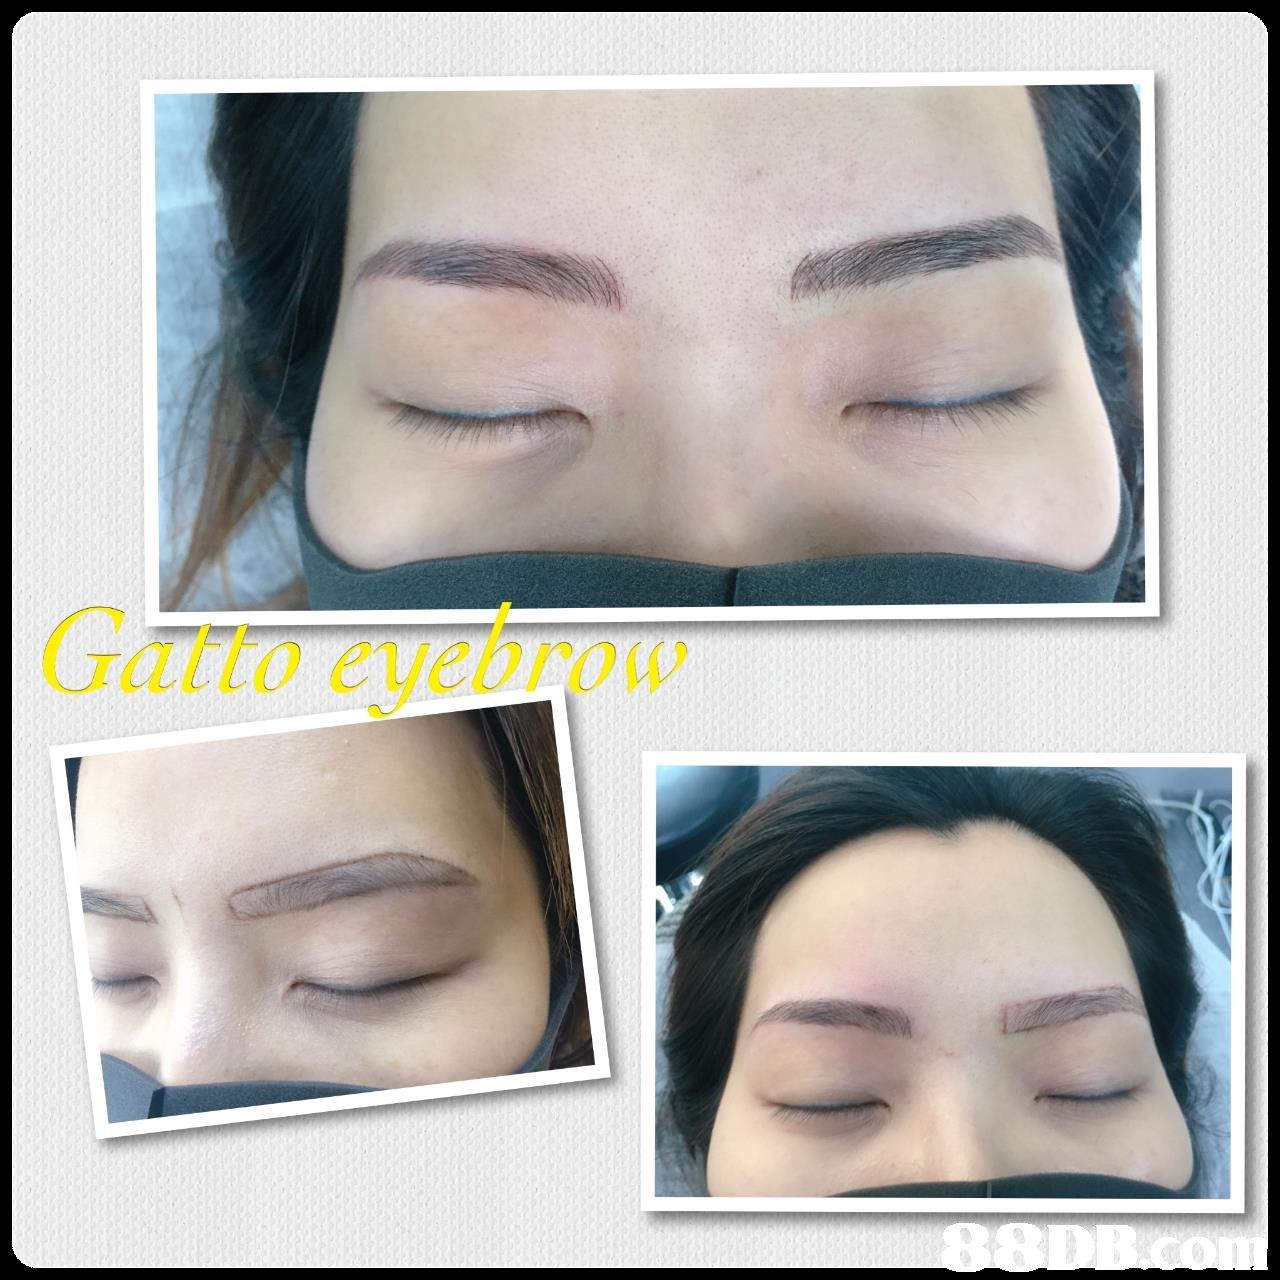 Gatto eyebro  eyebrow,eyelash,nose,forehead,chin